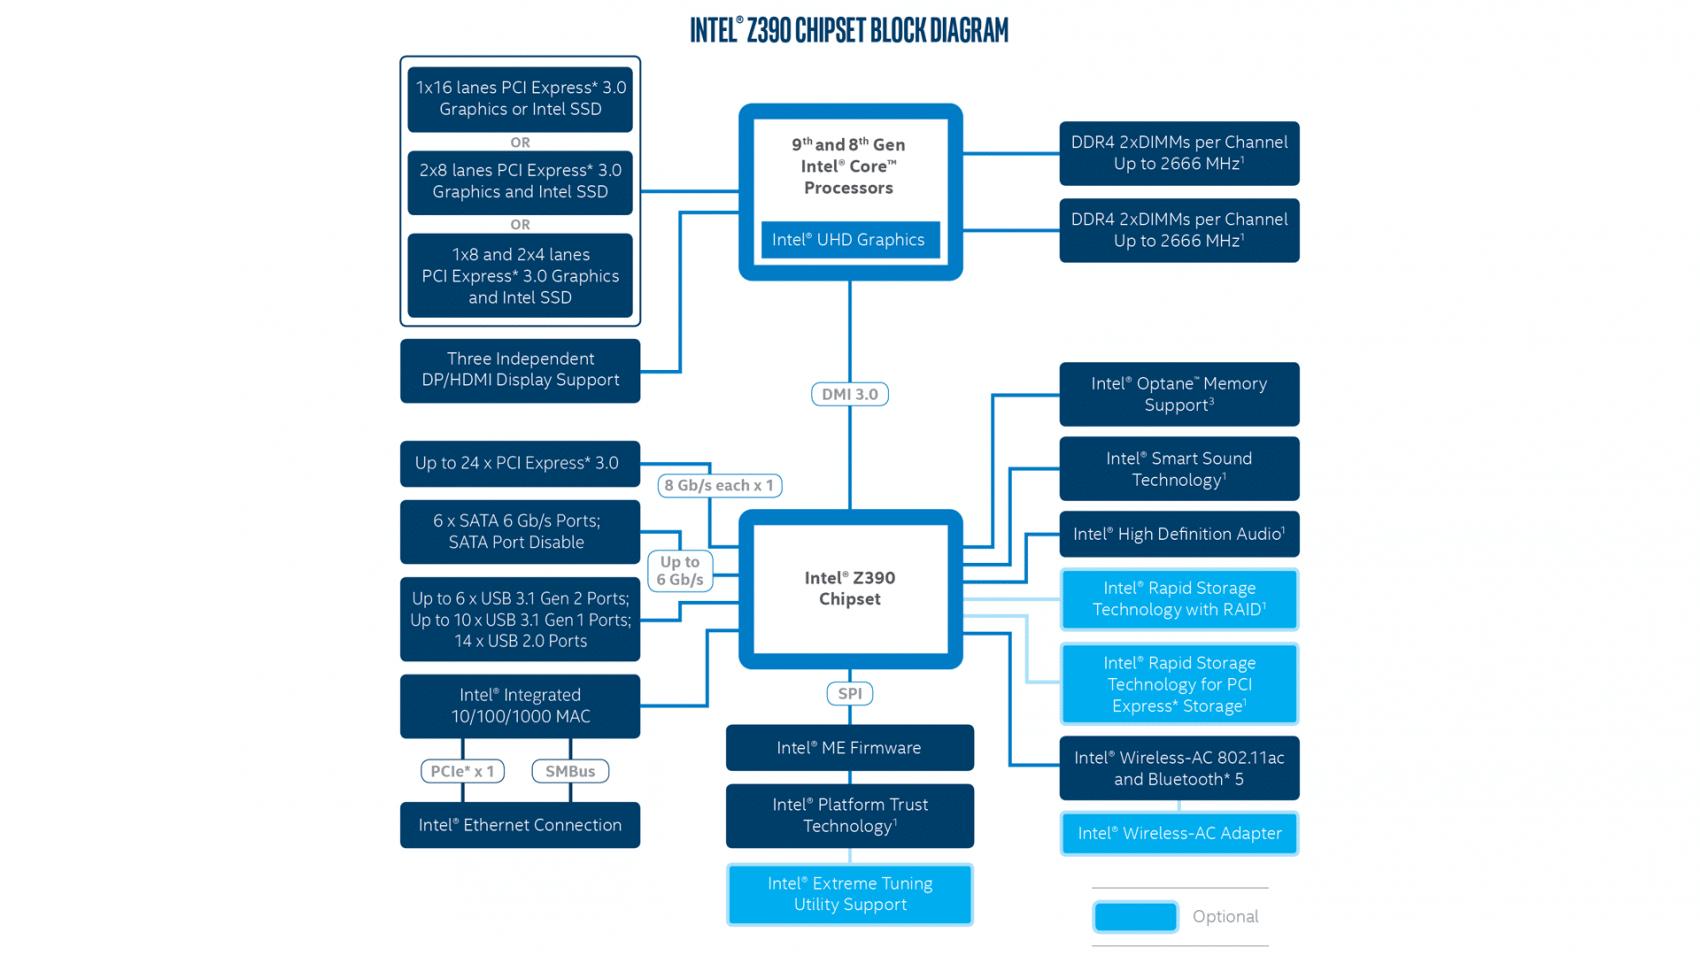 Diagramme chipset Intel Z390